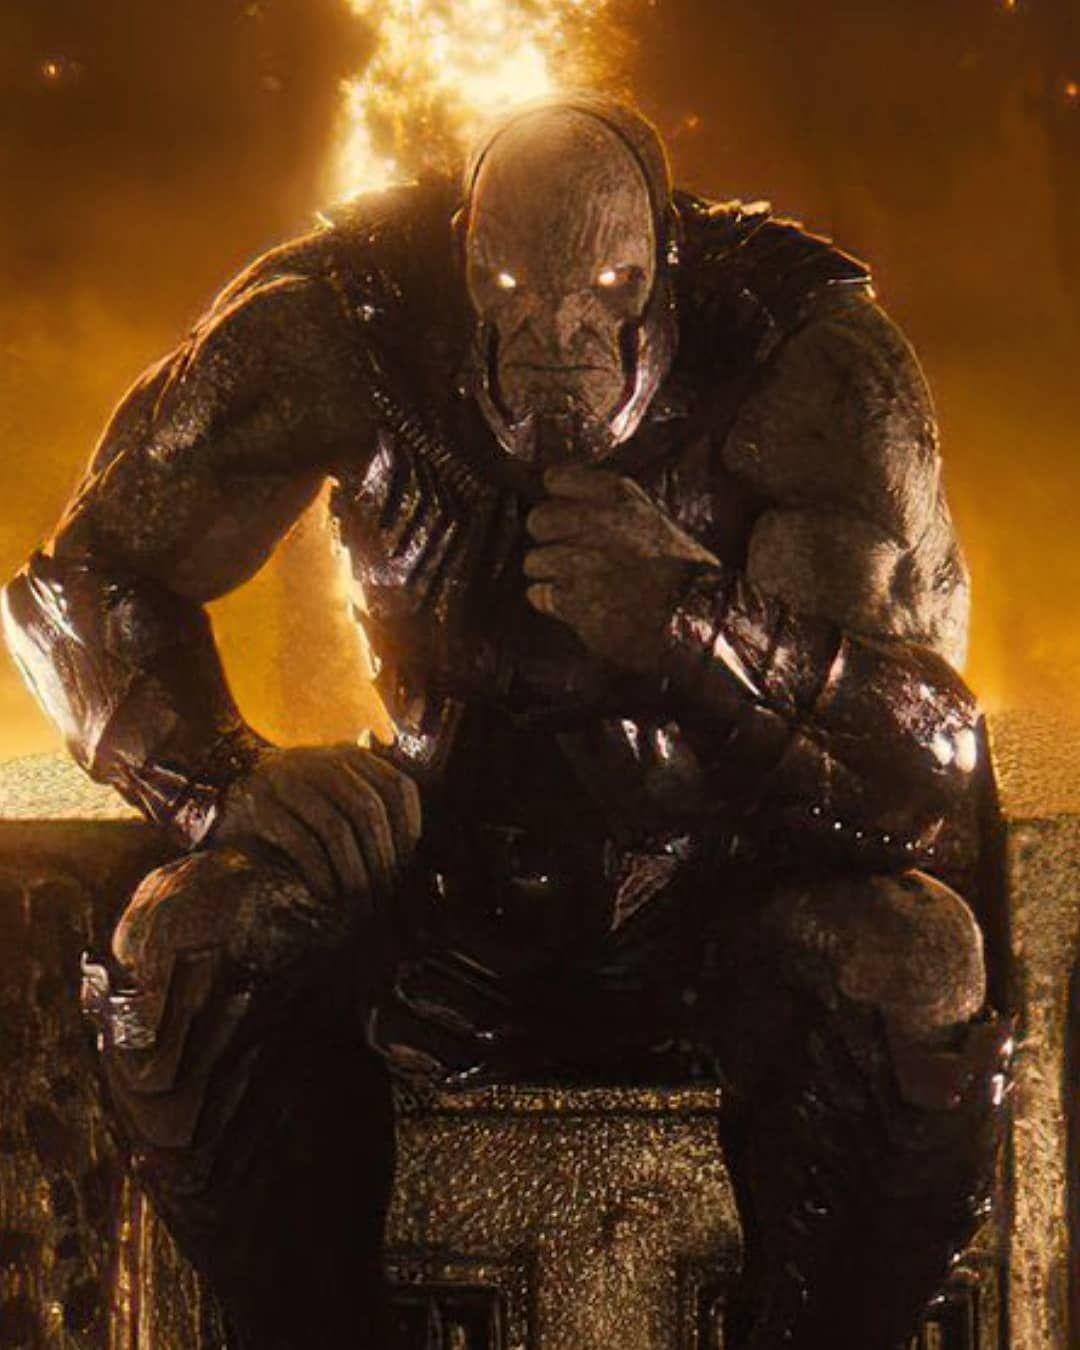 Darkseid Is Coming In 2021 Comic Villains Dc Comics Wallpaper Dc Comics Superheroes